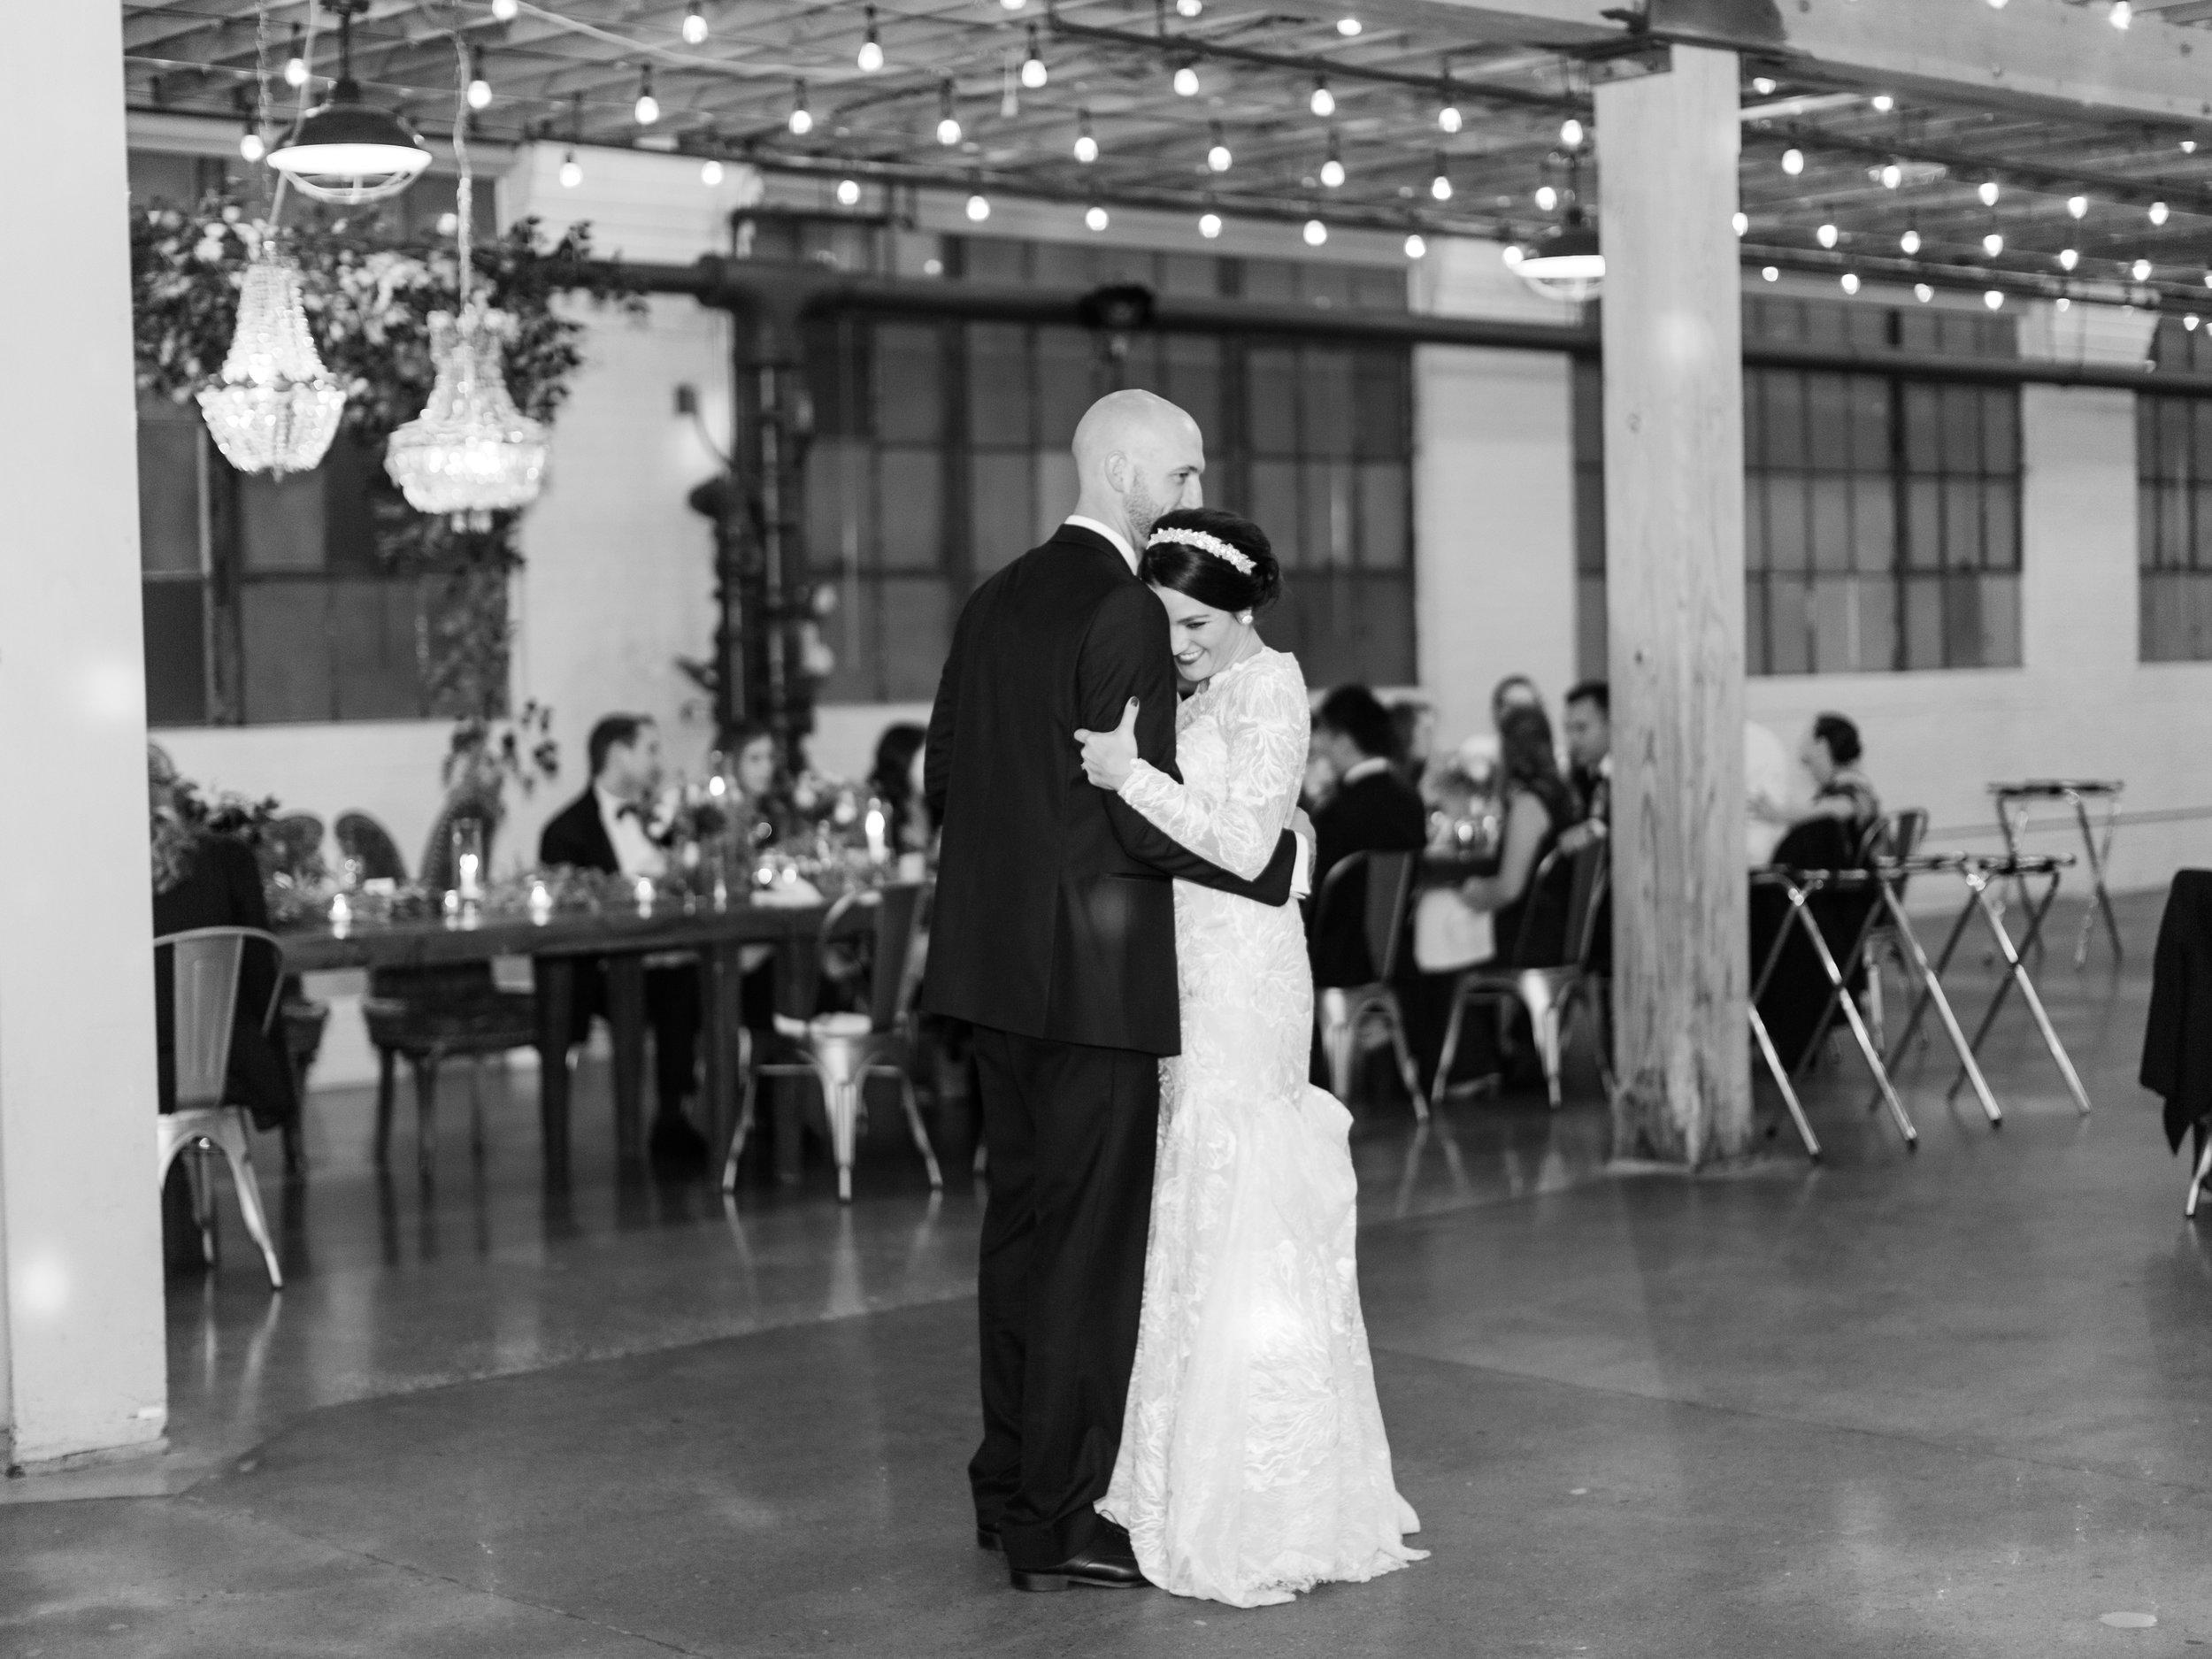 Vogelzang+Wedding+Reception+Dancing-12.jpg